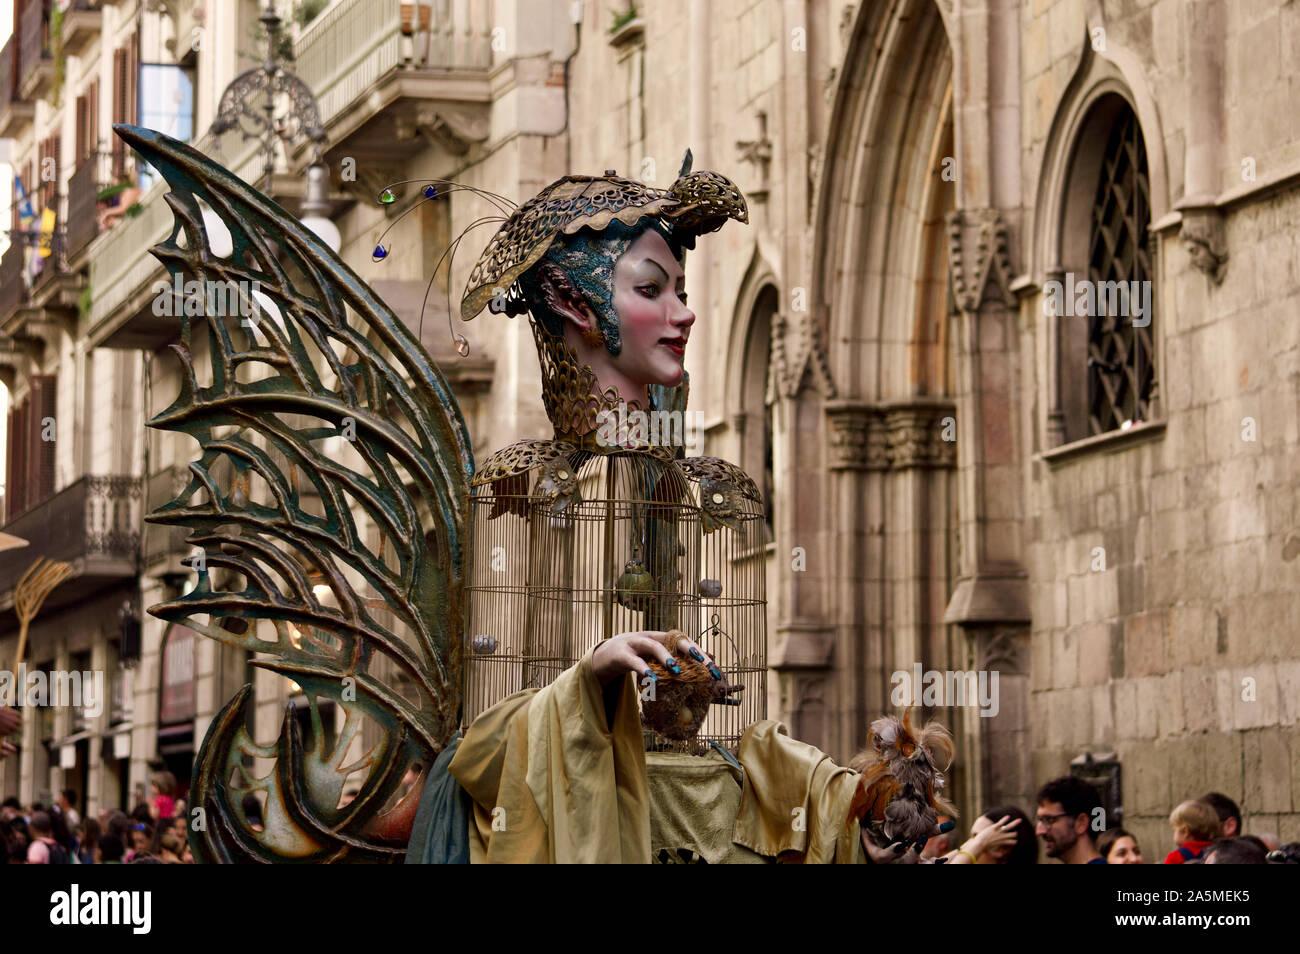 Die Riesen Parade während La Merce Festival 2019 am Placa de Sant Jaume in Barcelona, Spanien Stockfoto